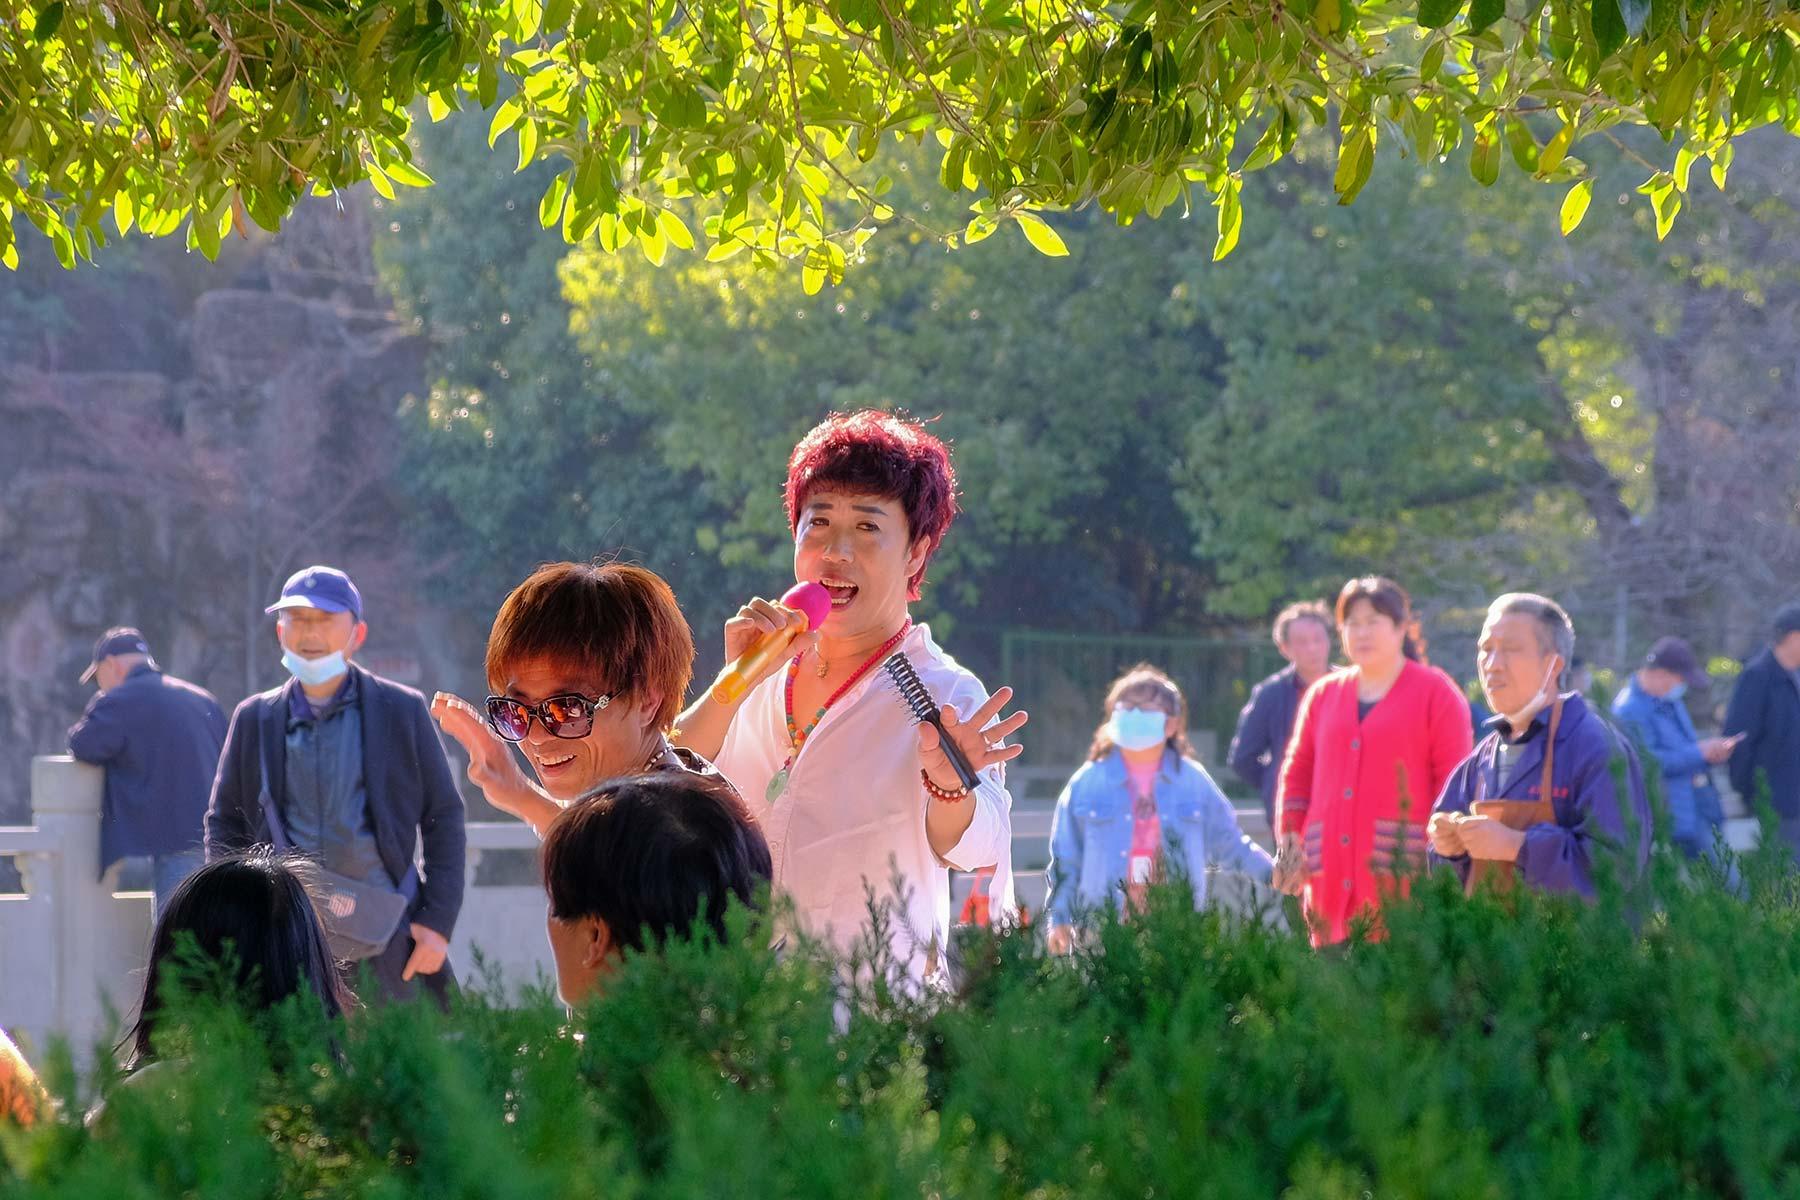 Musiker im Zhongshan Park in Ningbo, China